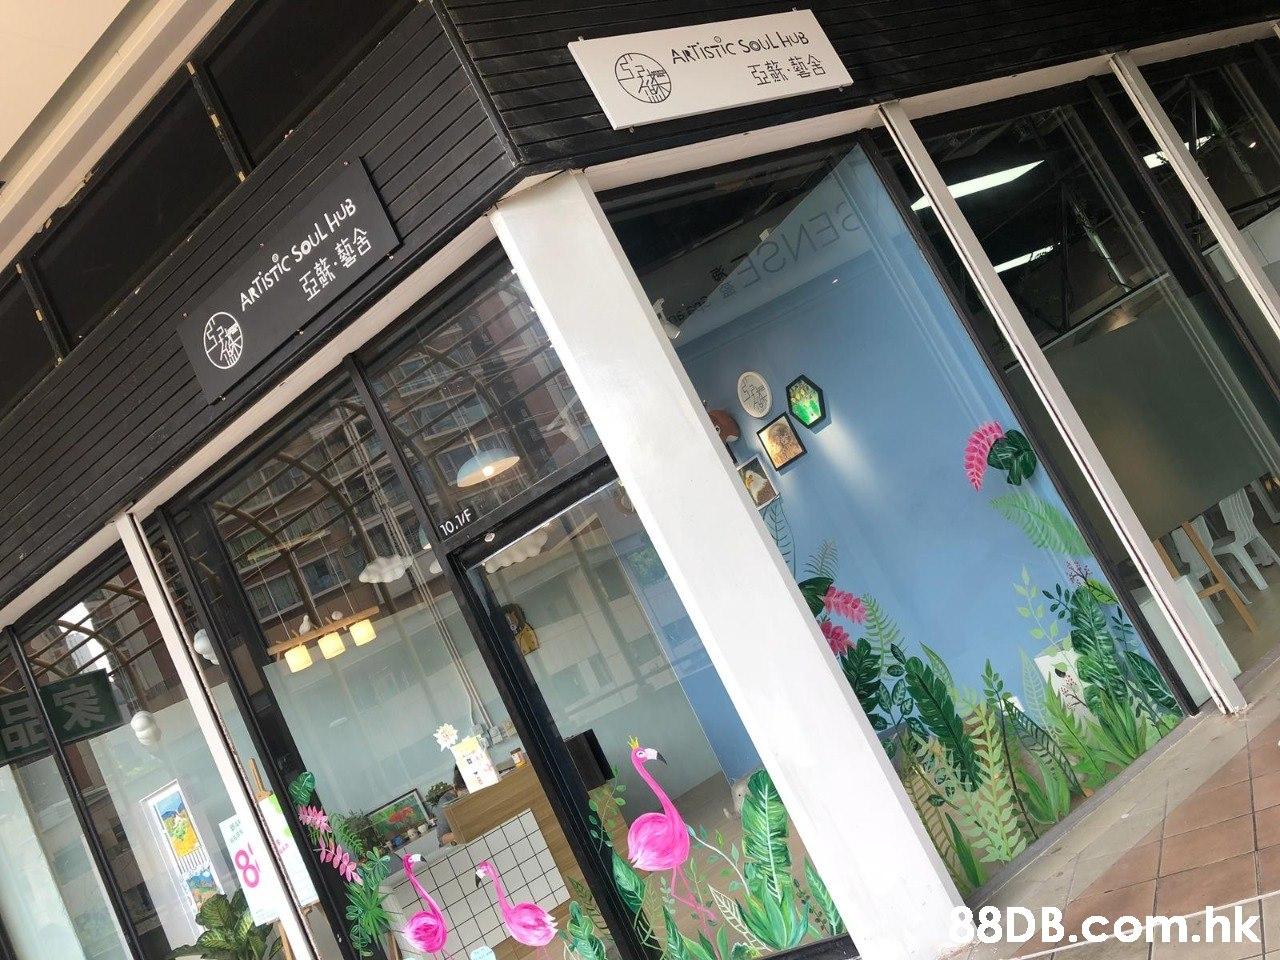 ARTISTIC SOUL HUB ARTISTIC SoUl HUB 亞蘇-藝合 10.1/F 38DB.com.hk OH  Building,Architecture,Glass,Real estate,Interior design